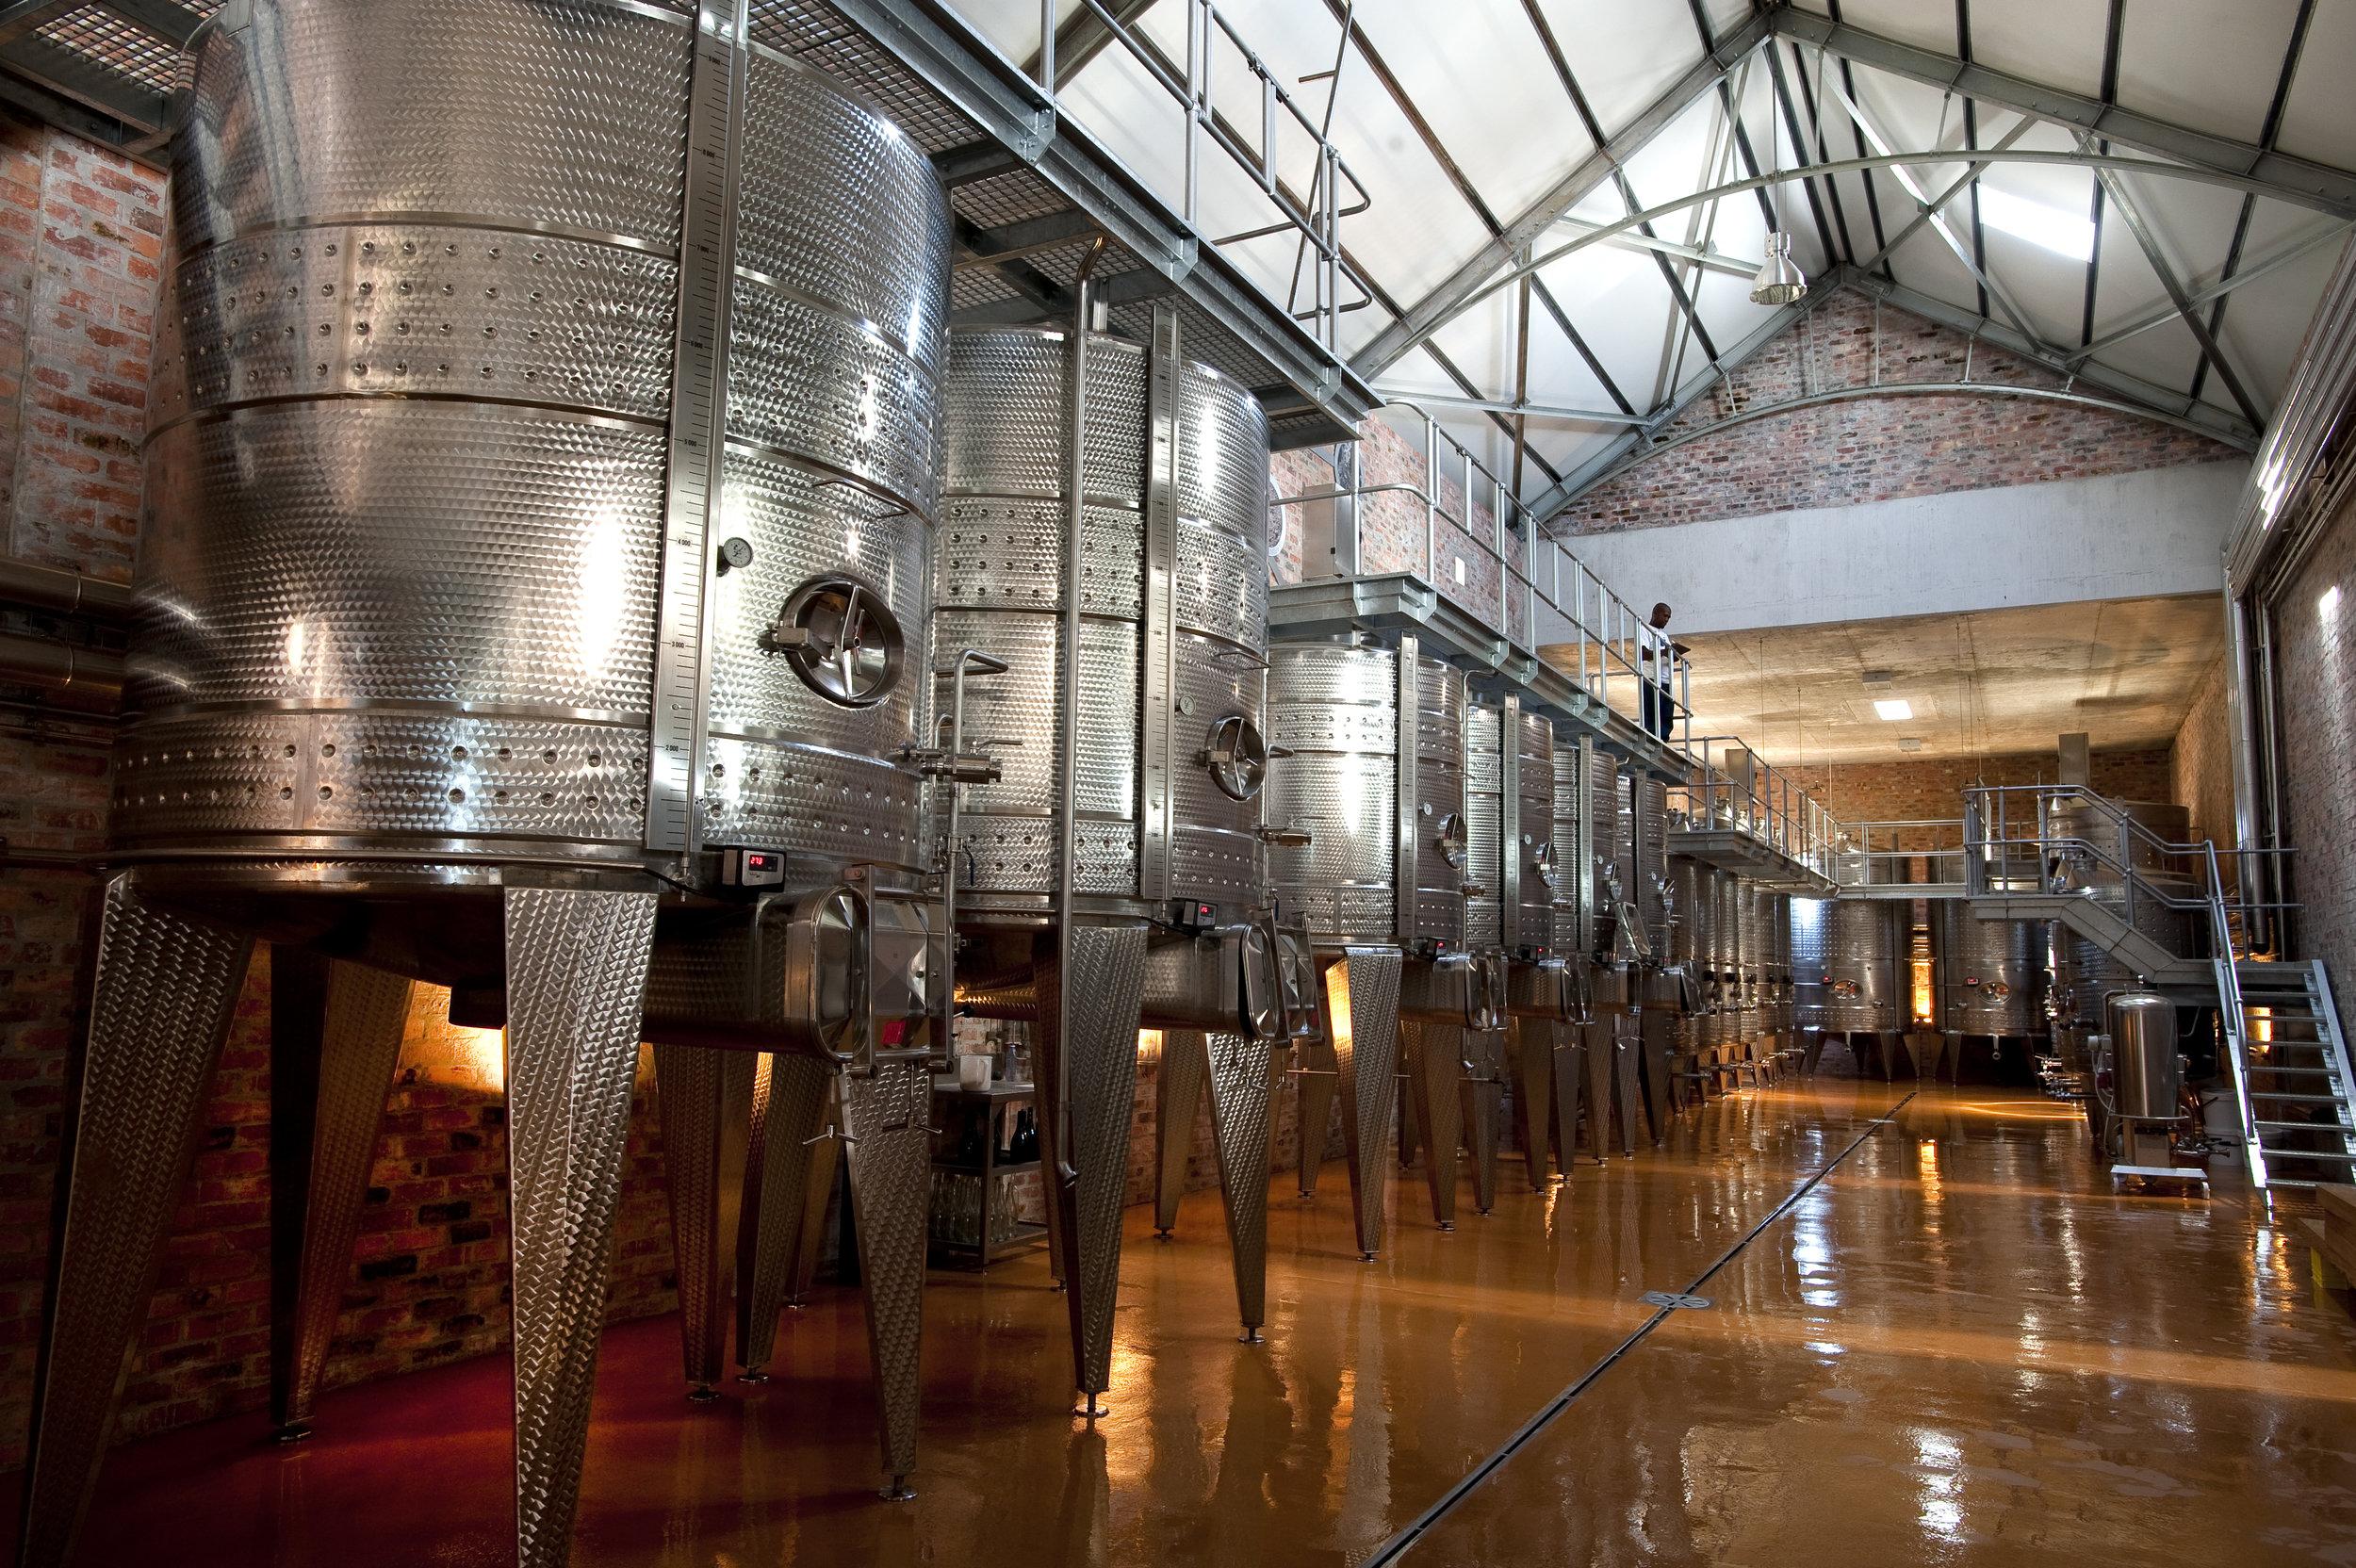 8.Wine cellar at Babylonstoren.jpg